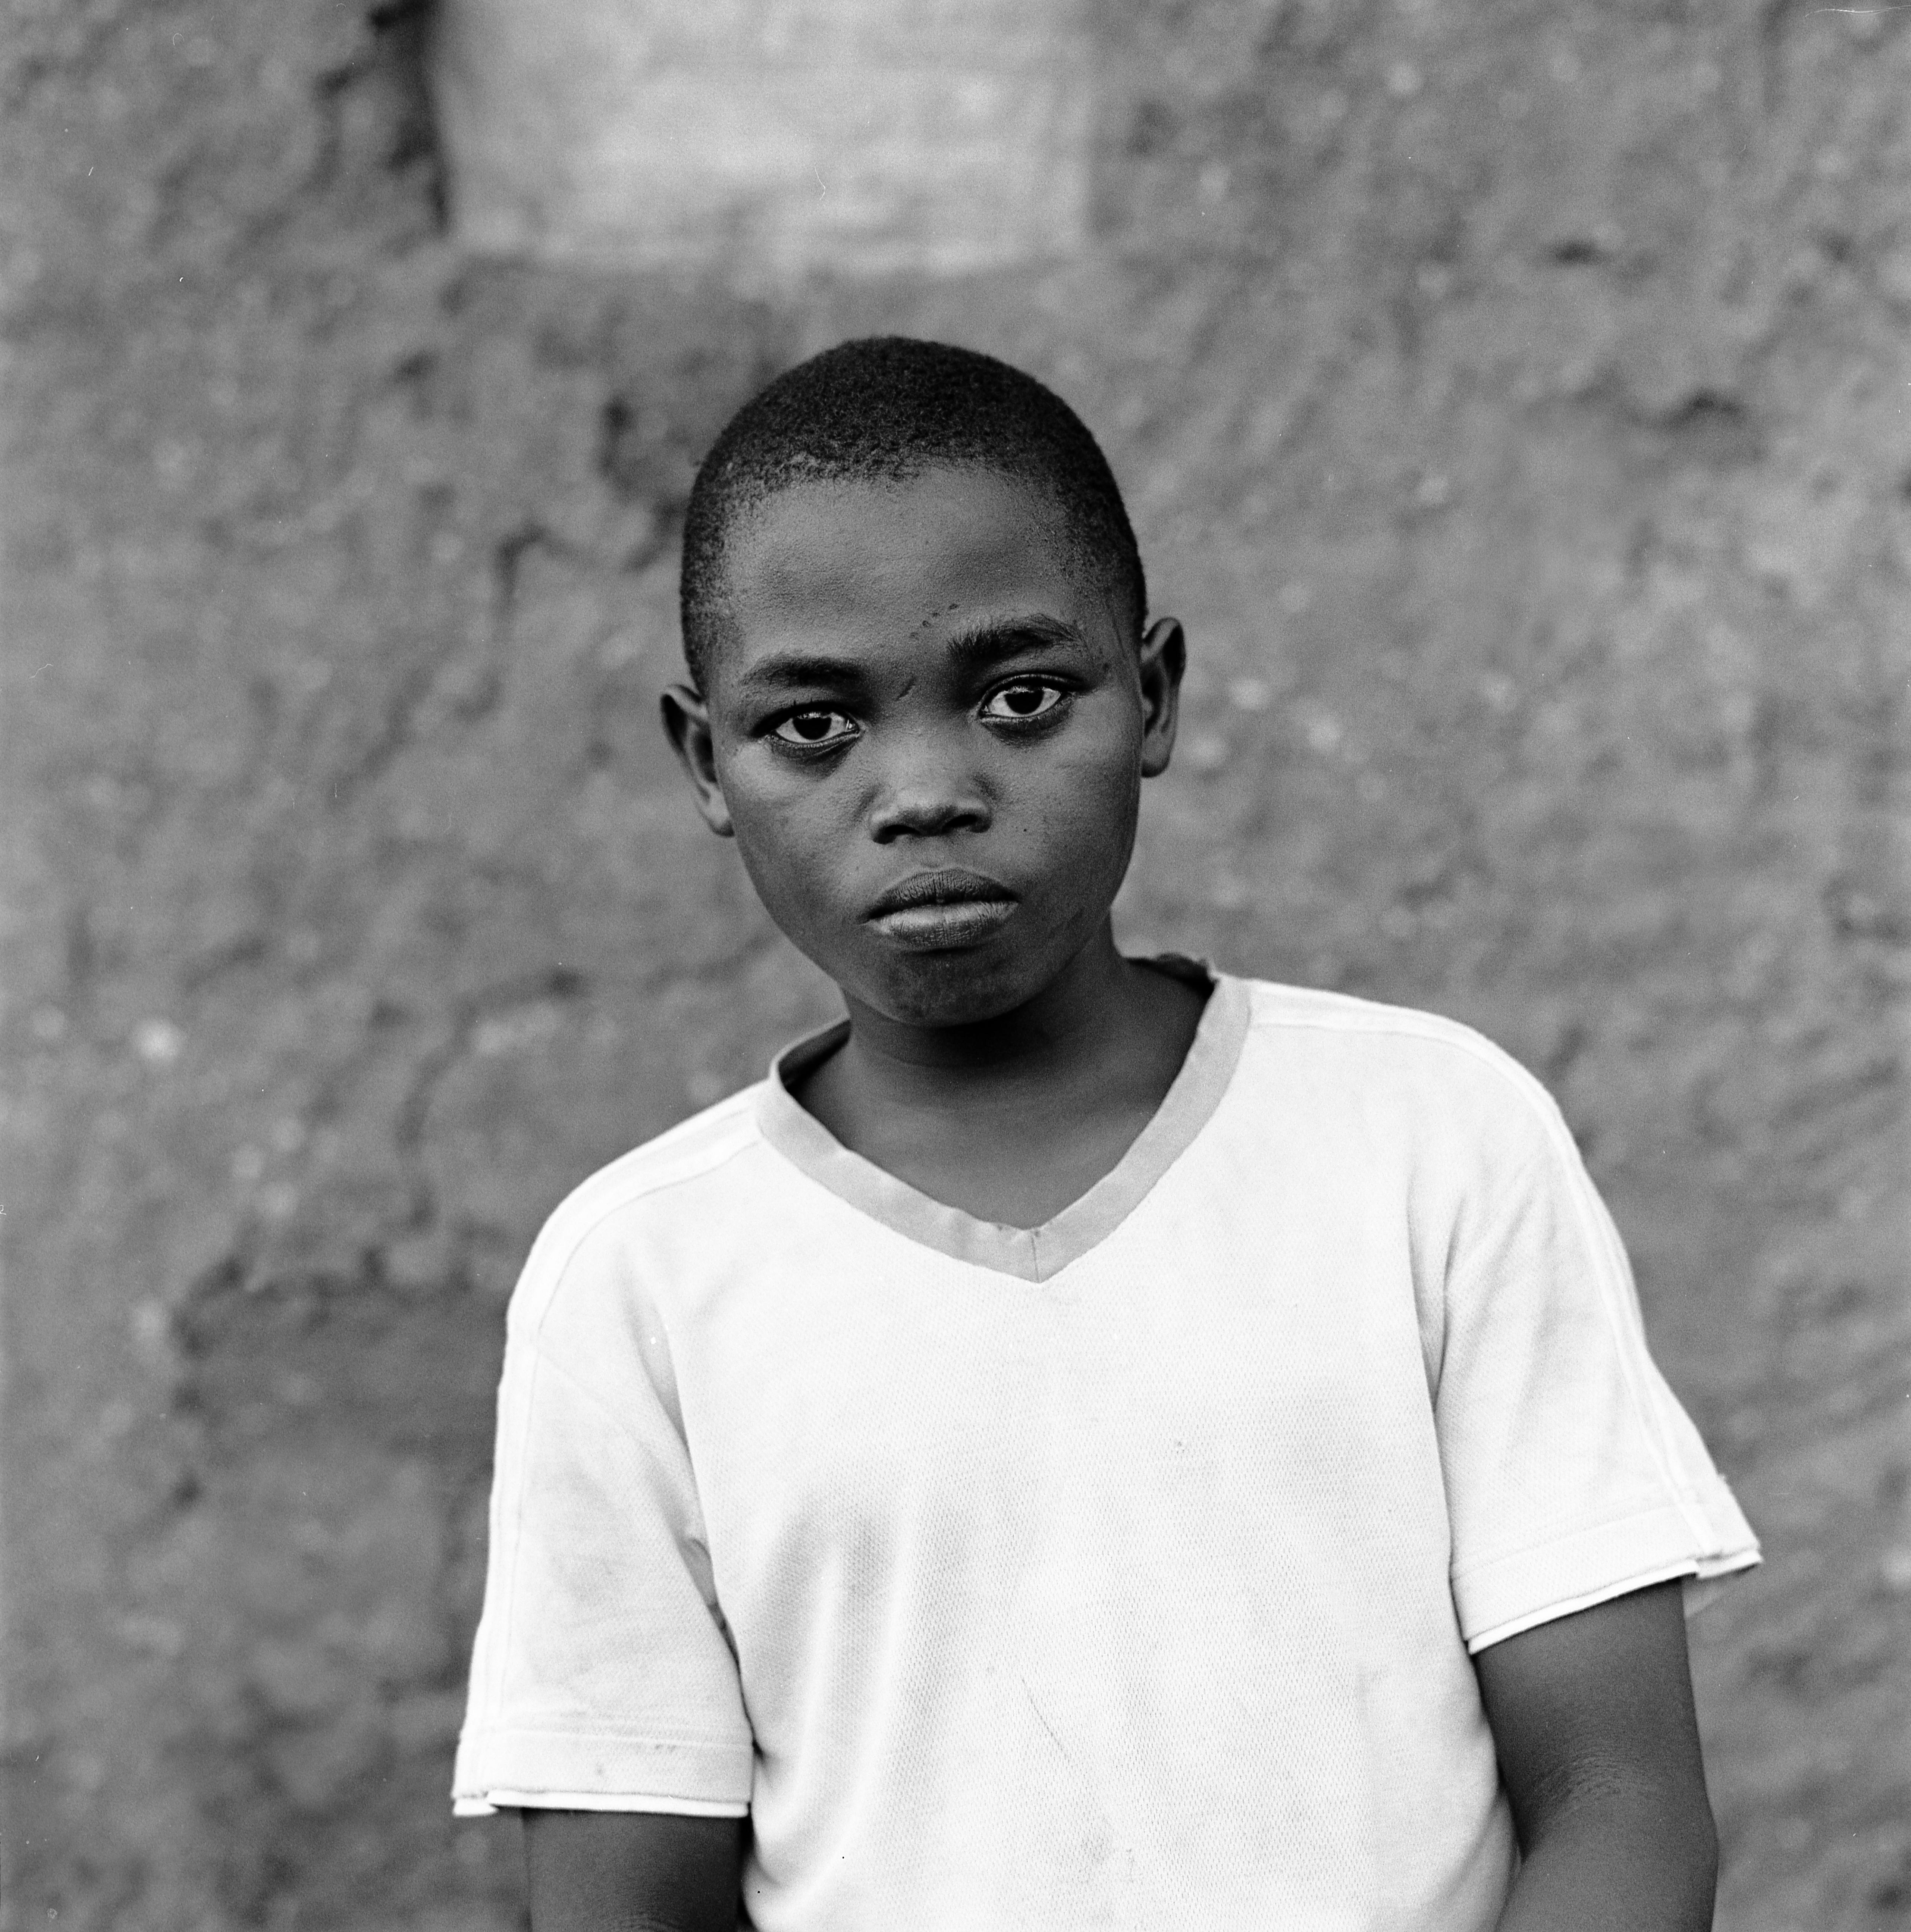 Solomon Ndukize